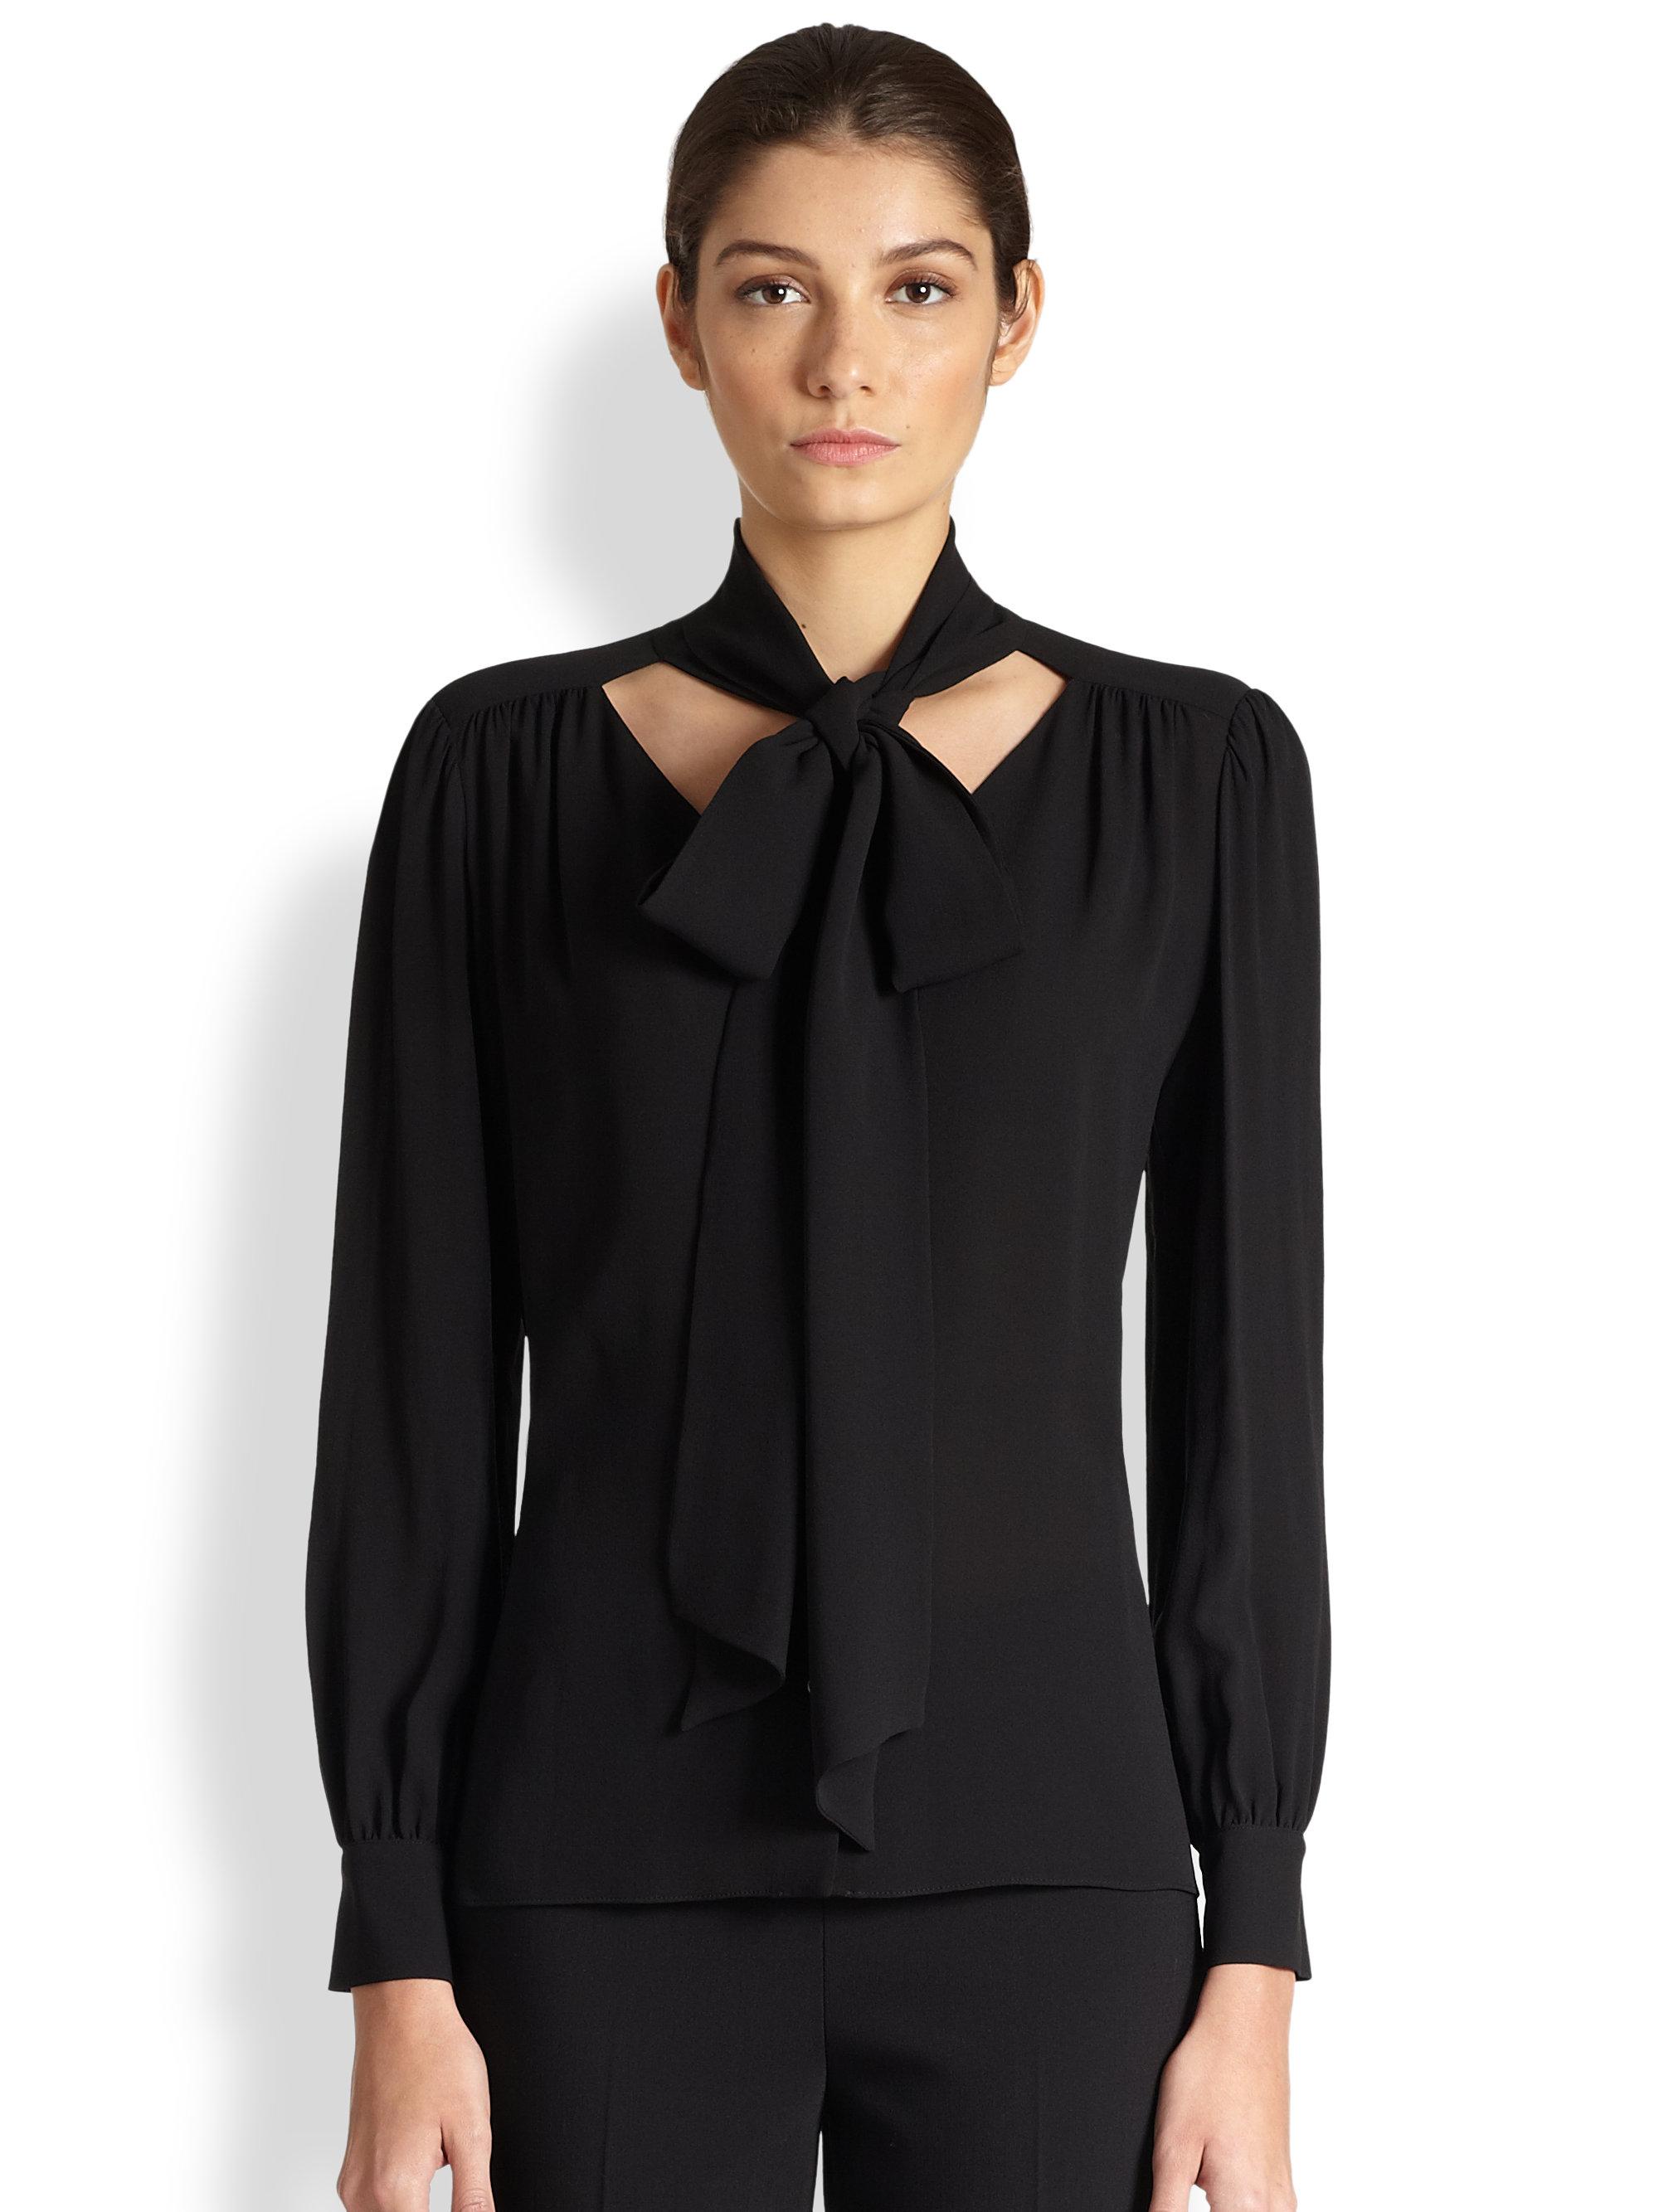 Sheer Black Blouse Long Sleeve